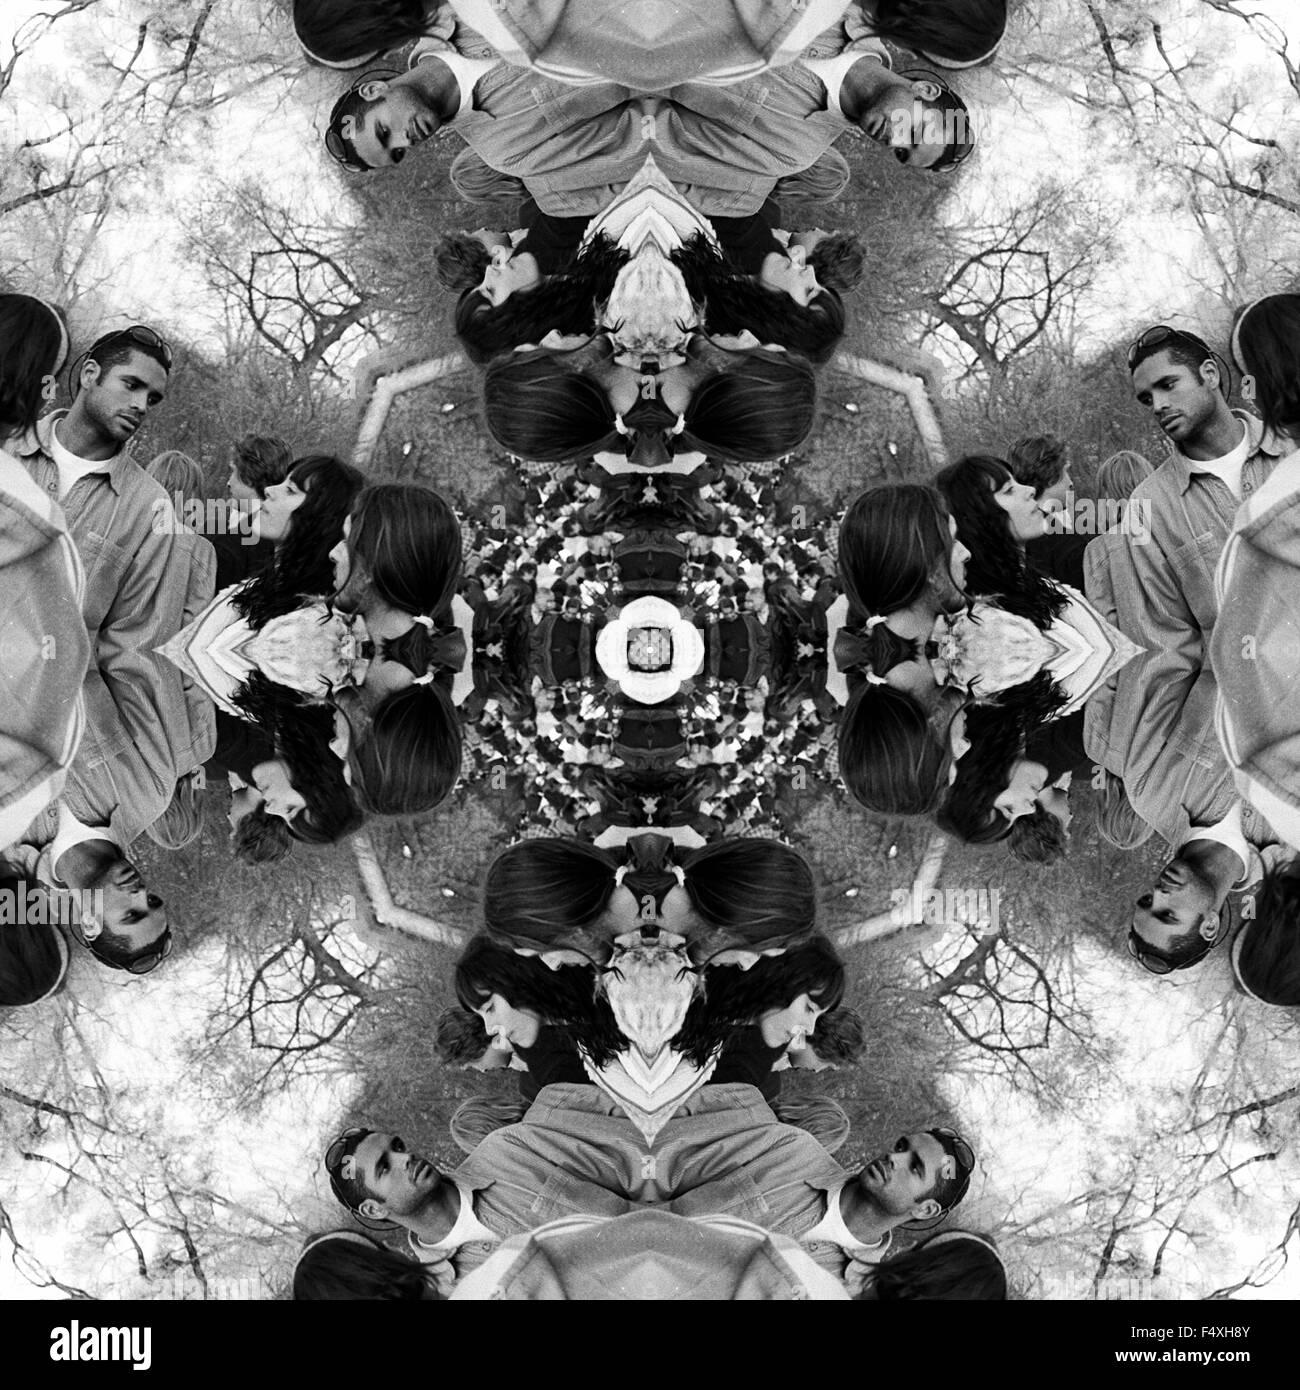 A kaleidoscopic image with people - Stock Image